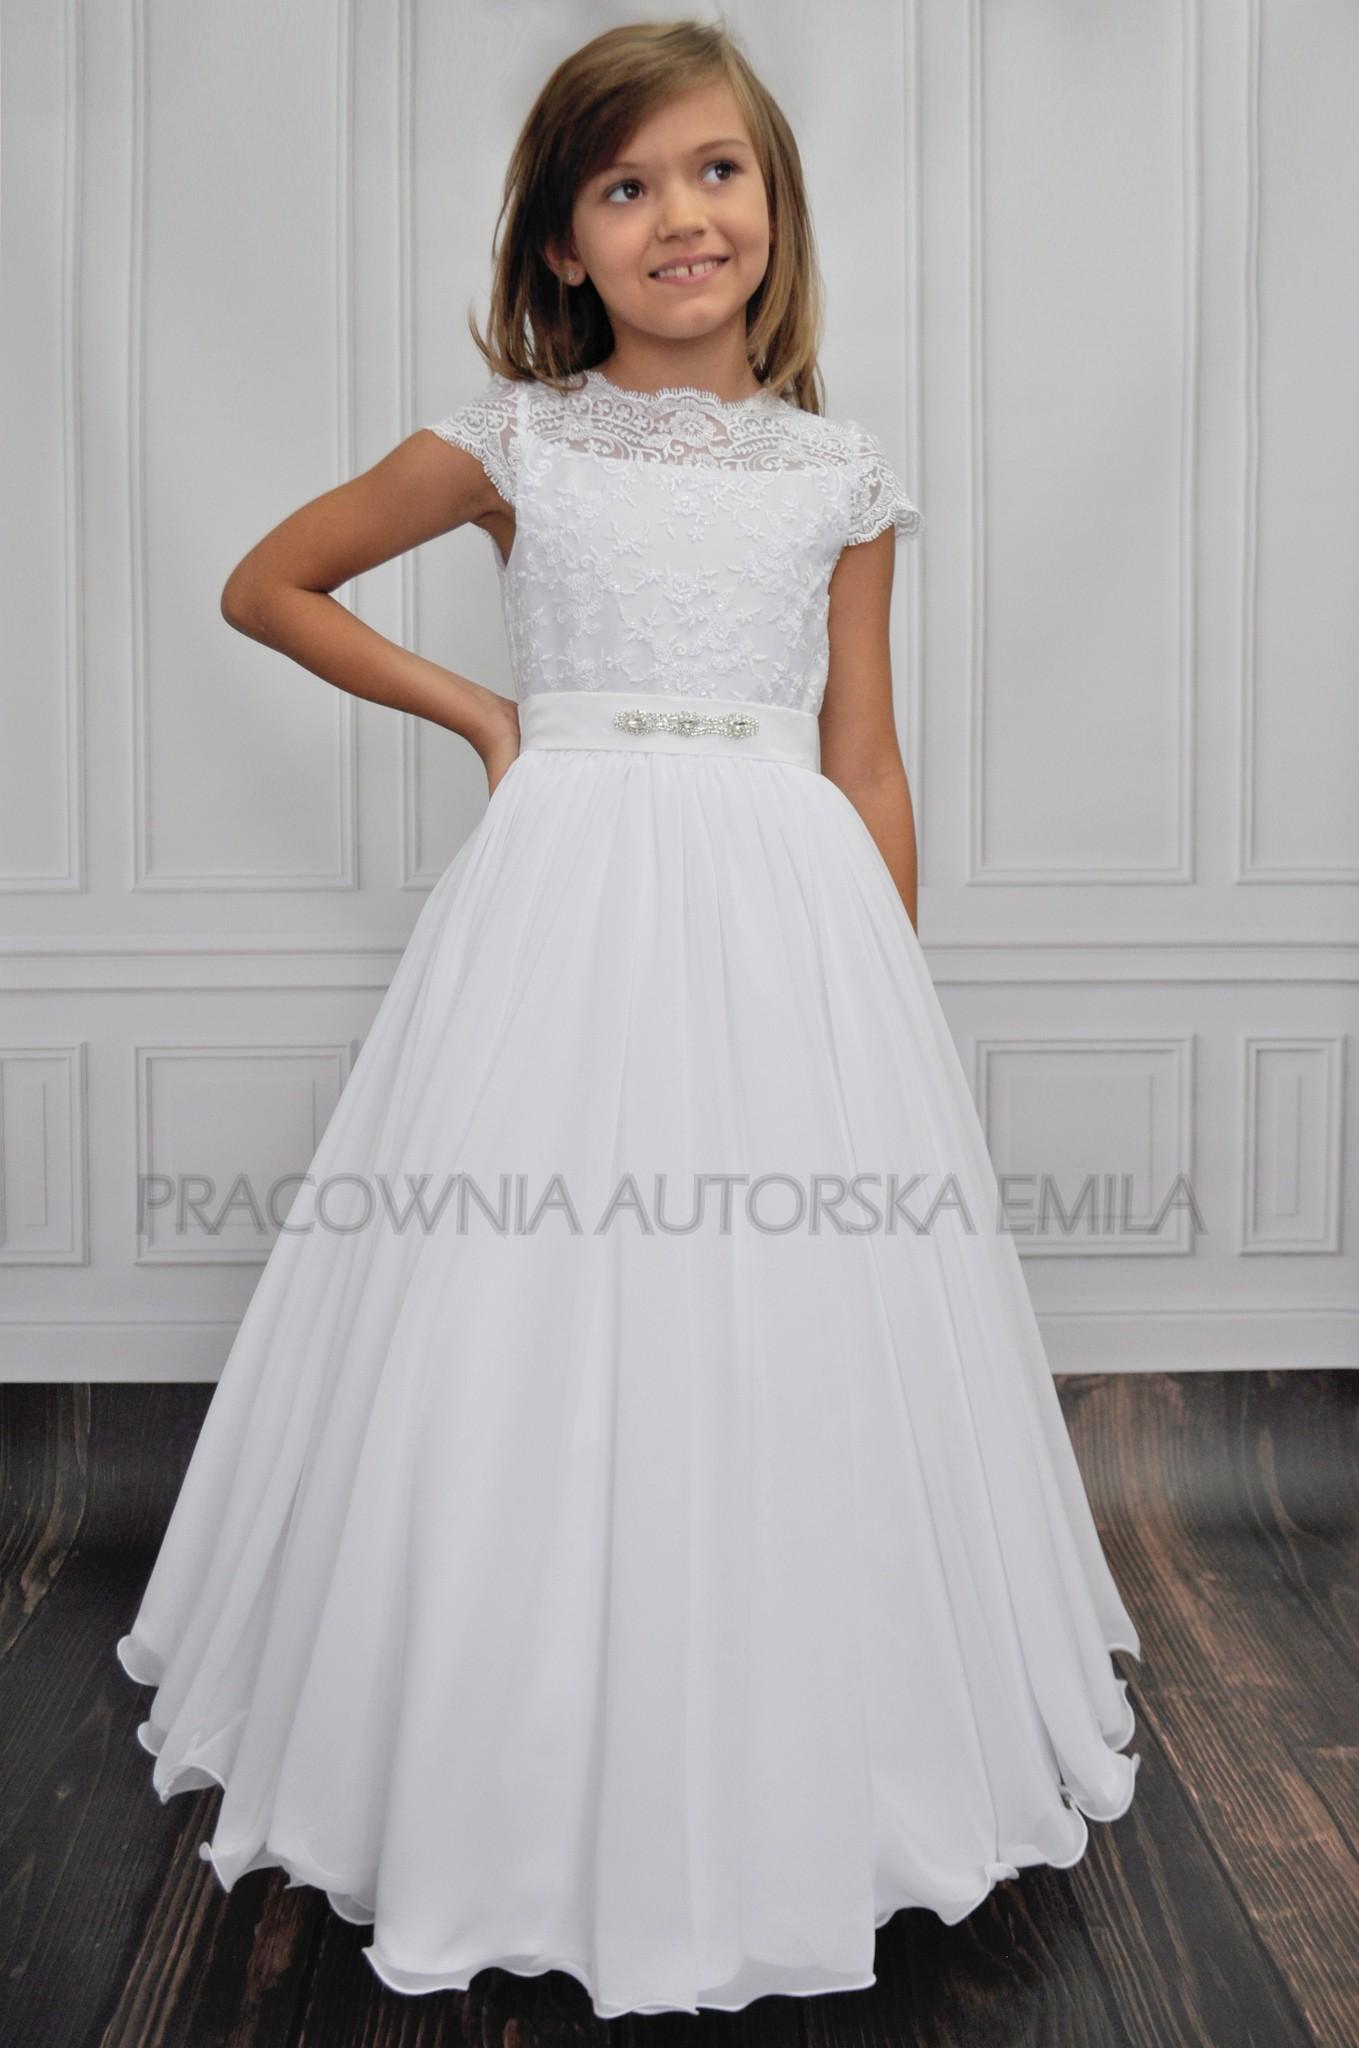 755ce0bacc Aurora sukienka komunijna